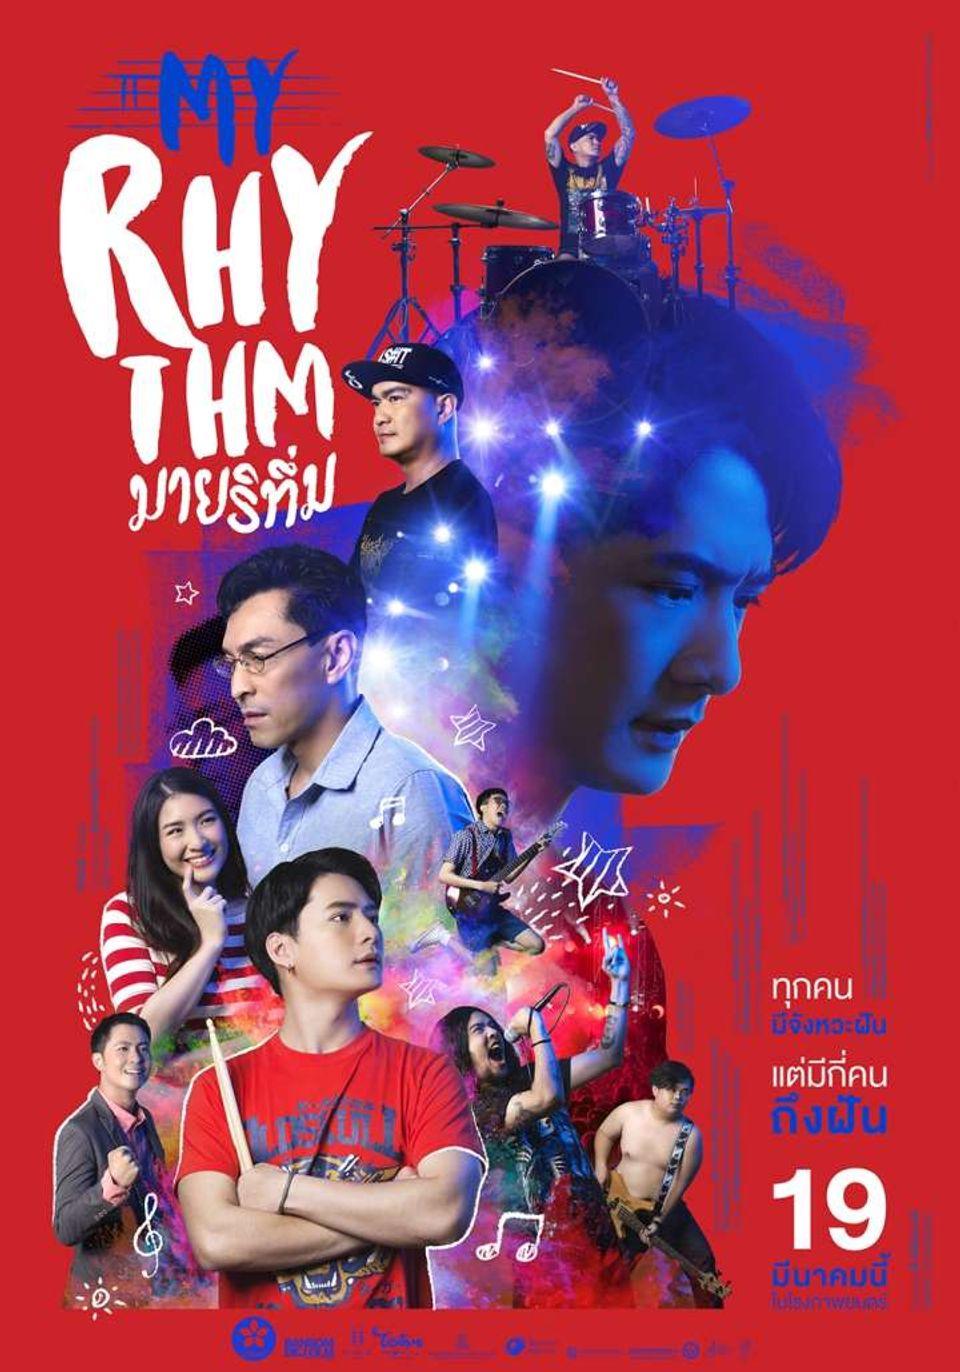 My Rhythm มายริทึ่ม ปล่อยตัวอย่างแรกก่อนเข้าฉาย 12 พฤศจิกายนนี้ ในโรงภาพยนตร์